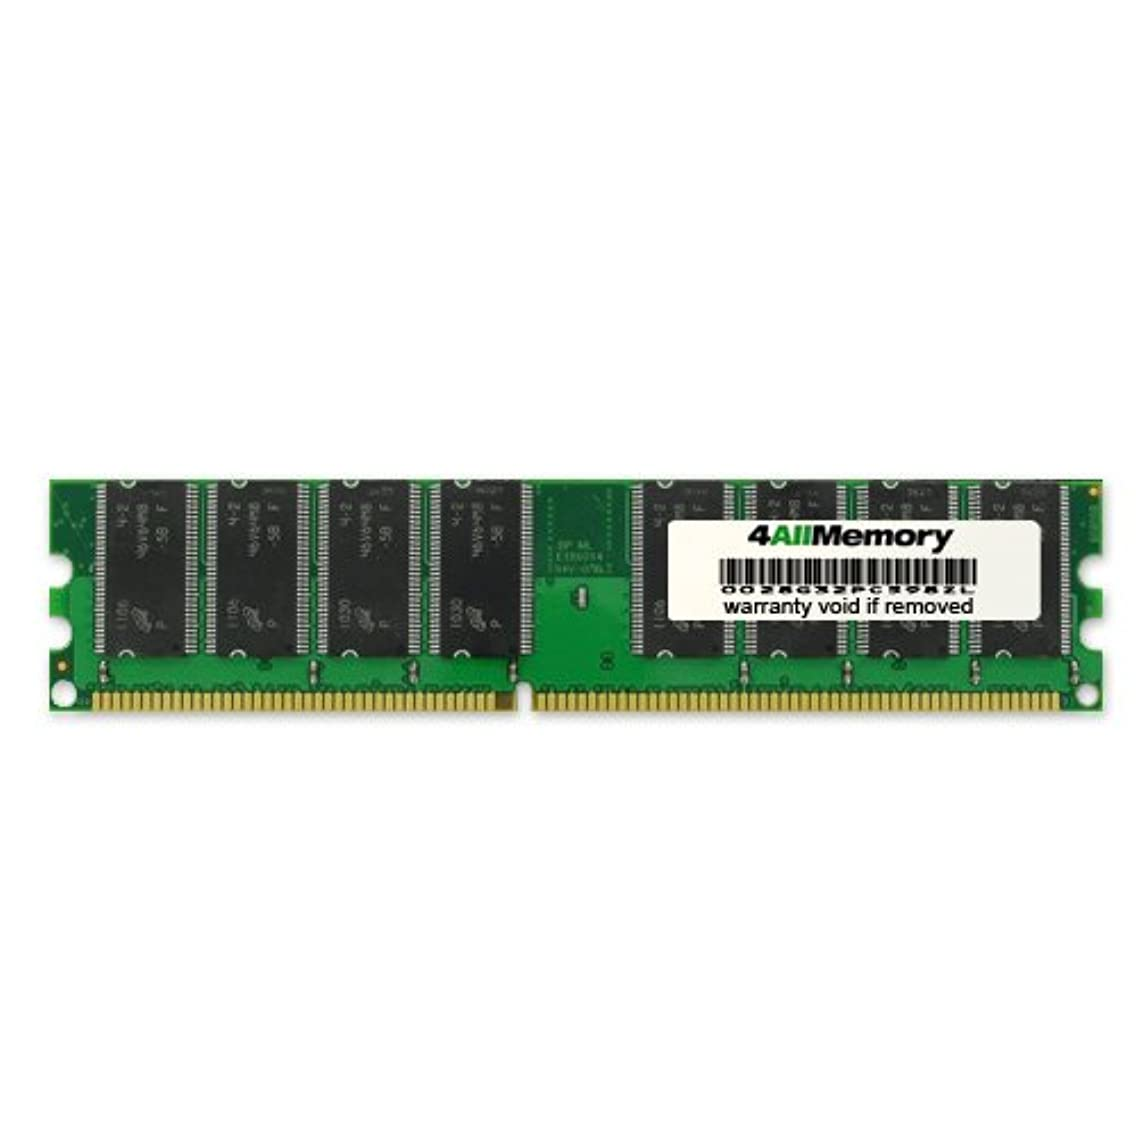 4GB [2x2GB] DDR-266 (PC2100) ECC Registered RAM Memory Upgrade Kit for the Compaq HP Workstation xw8000